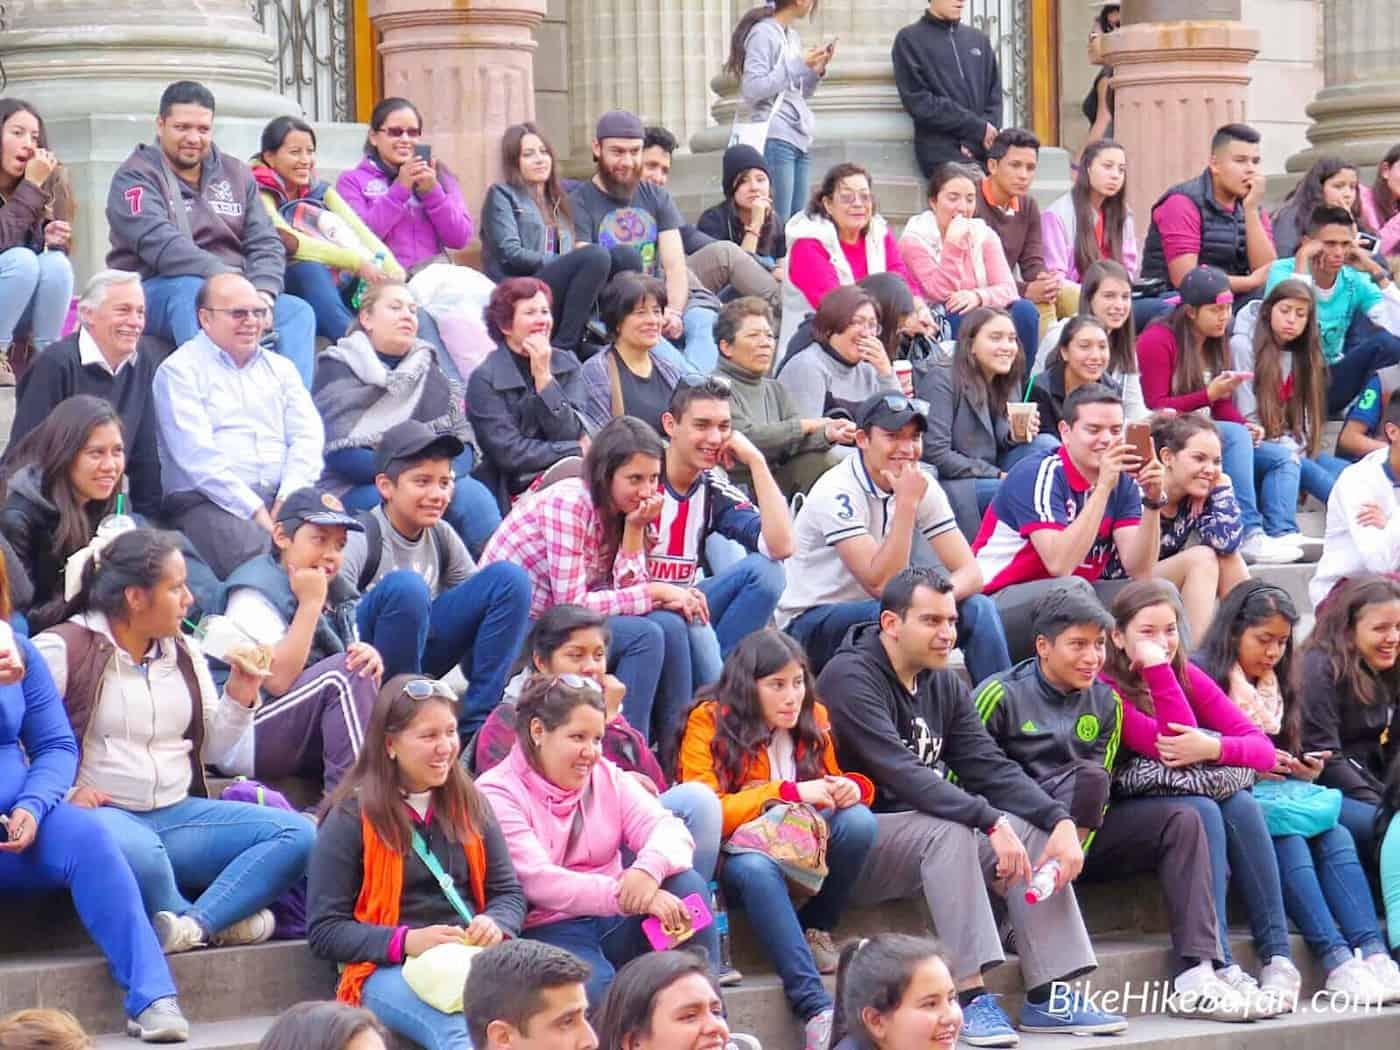 People of Guanajuato